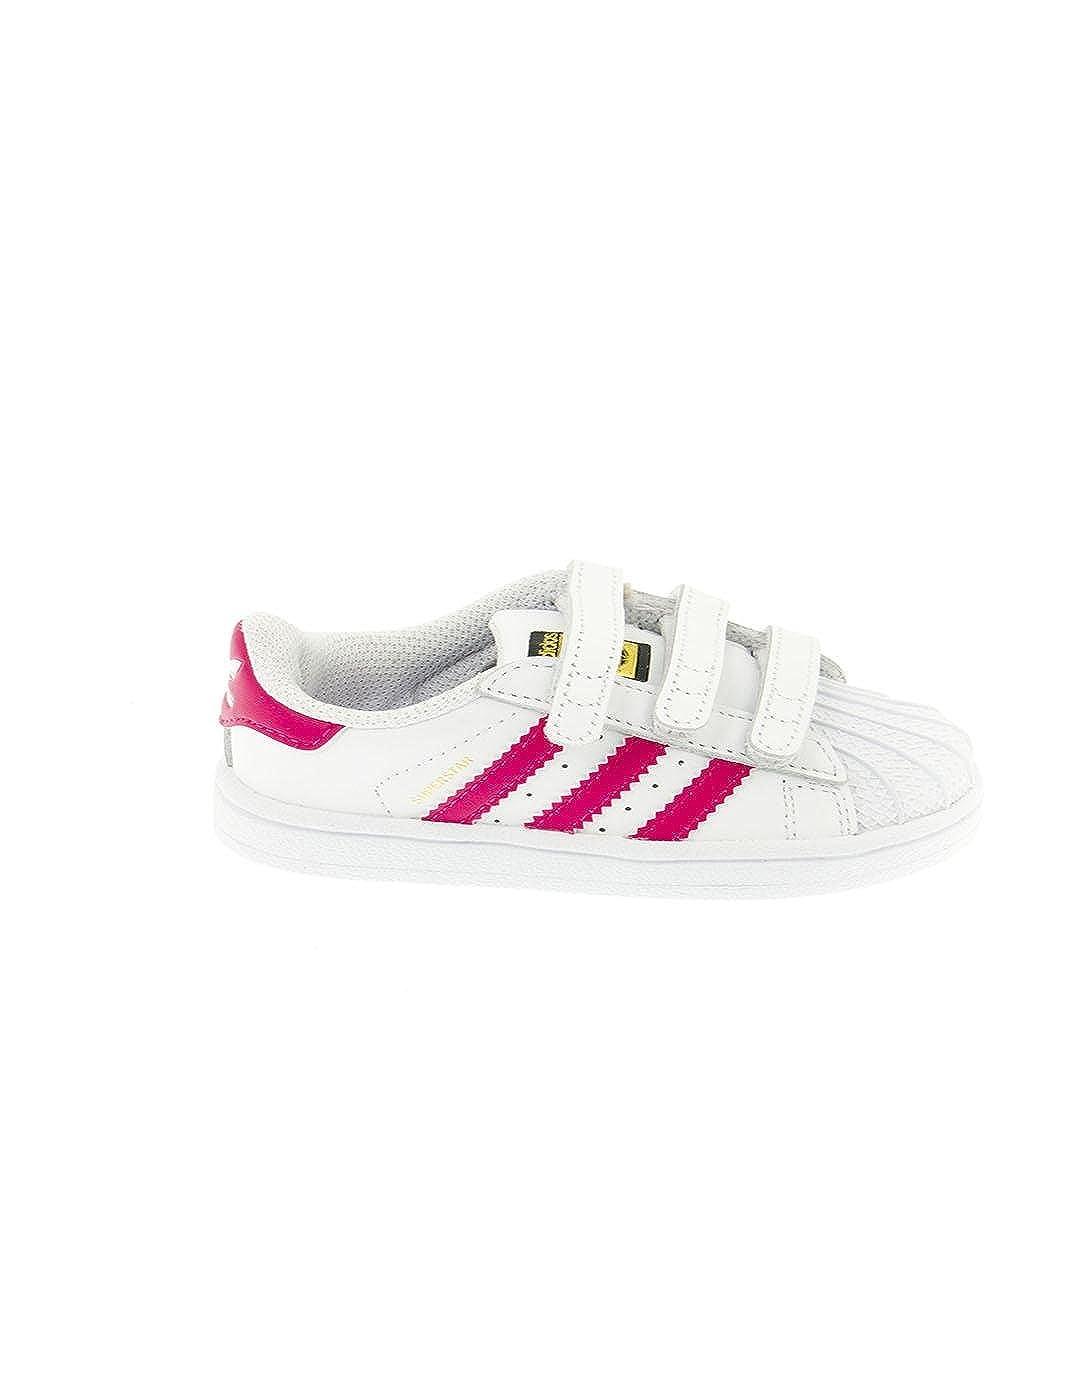 adidas Baby Unisex Low-Top Sneakers